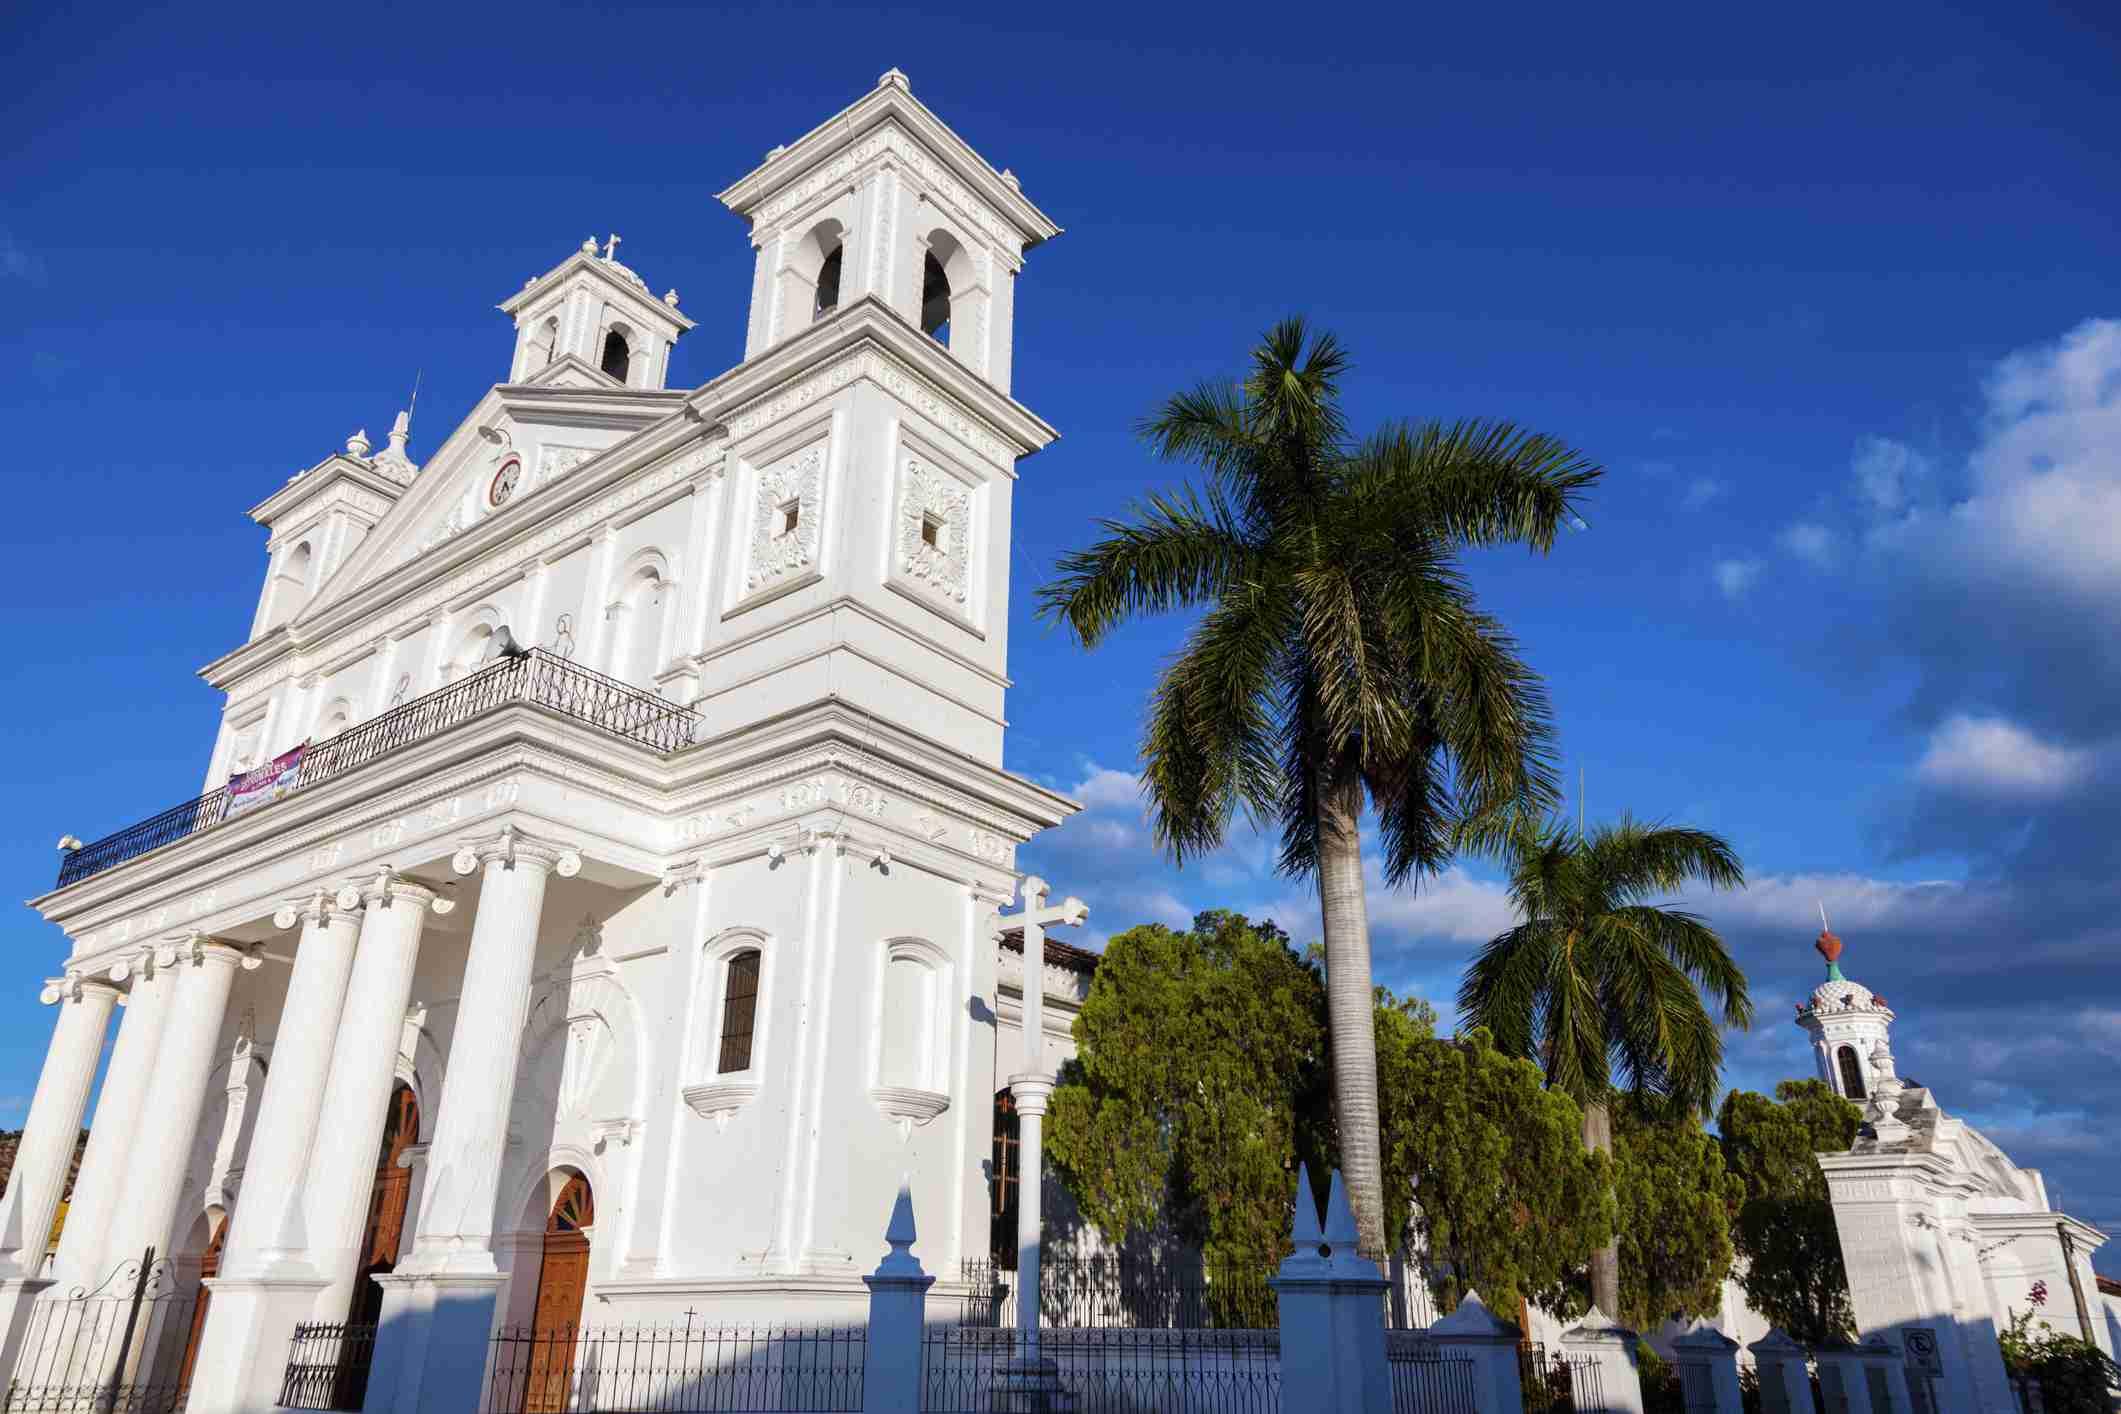 El Salvador, Cuscatlan, Suchitoto, Santa Lucia Church and palm trees